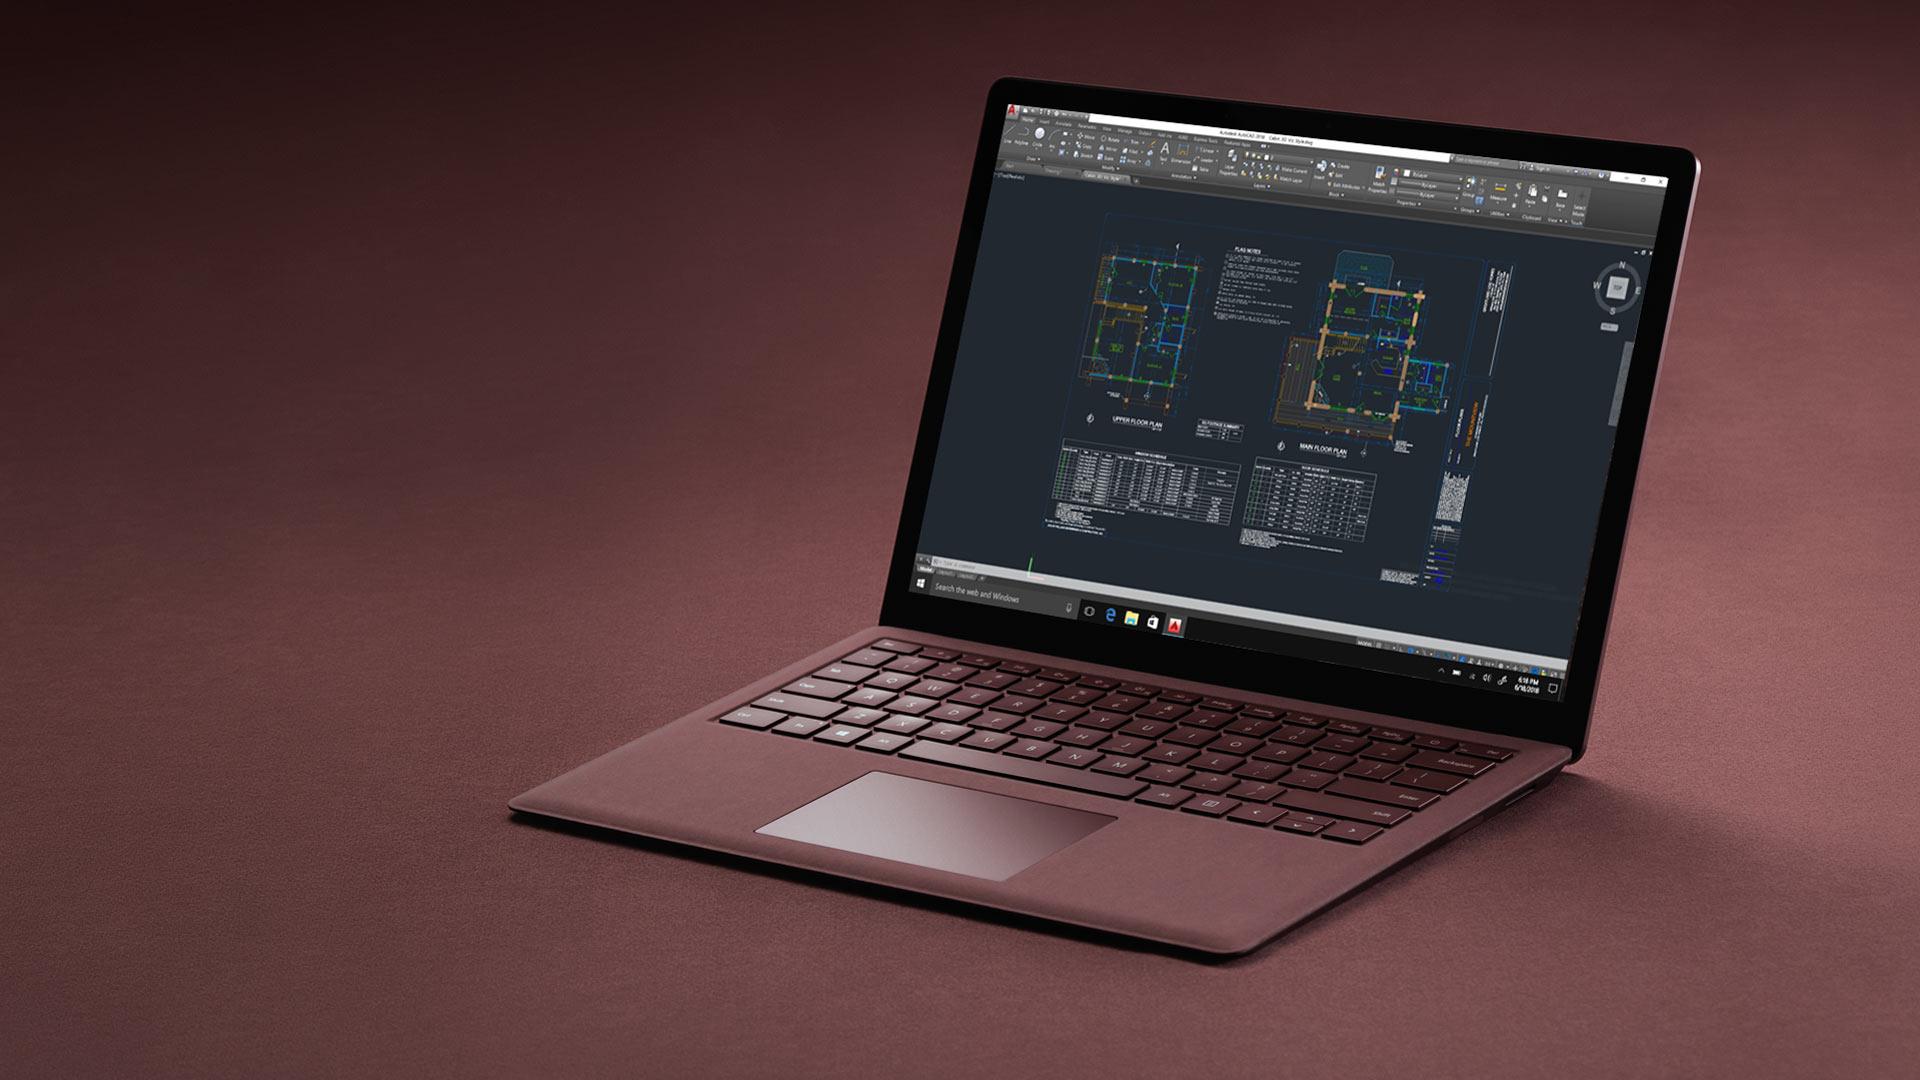 Surface Laptop in Bordeaux Rot mit AutoCAD-Bildschirm.